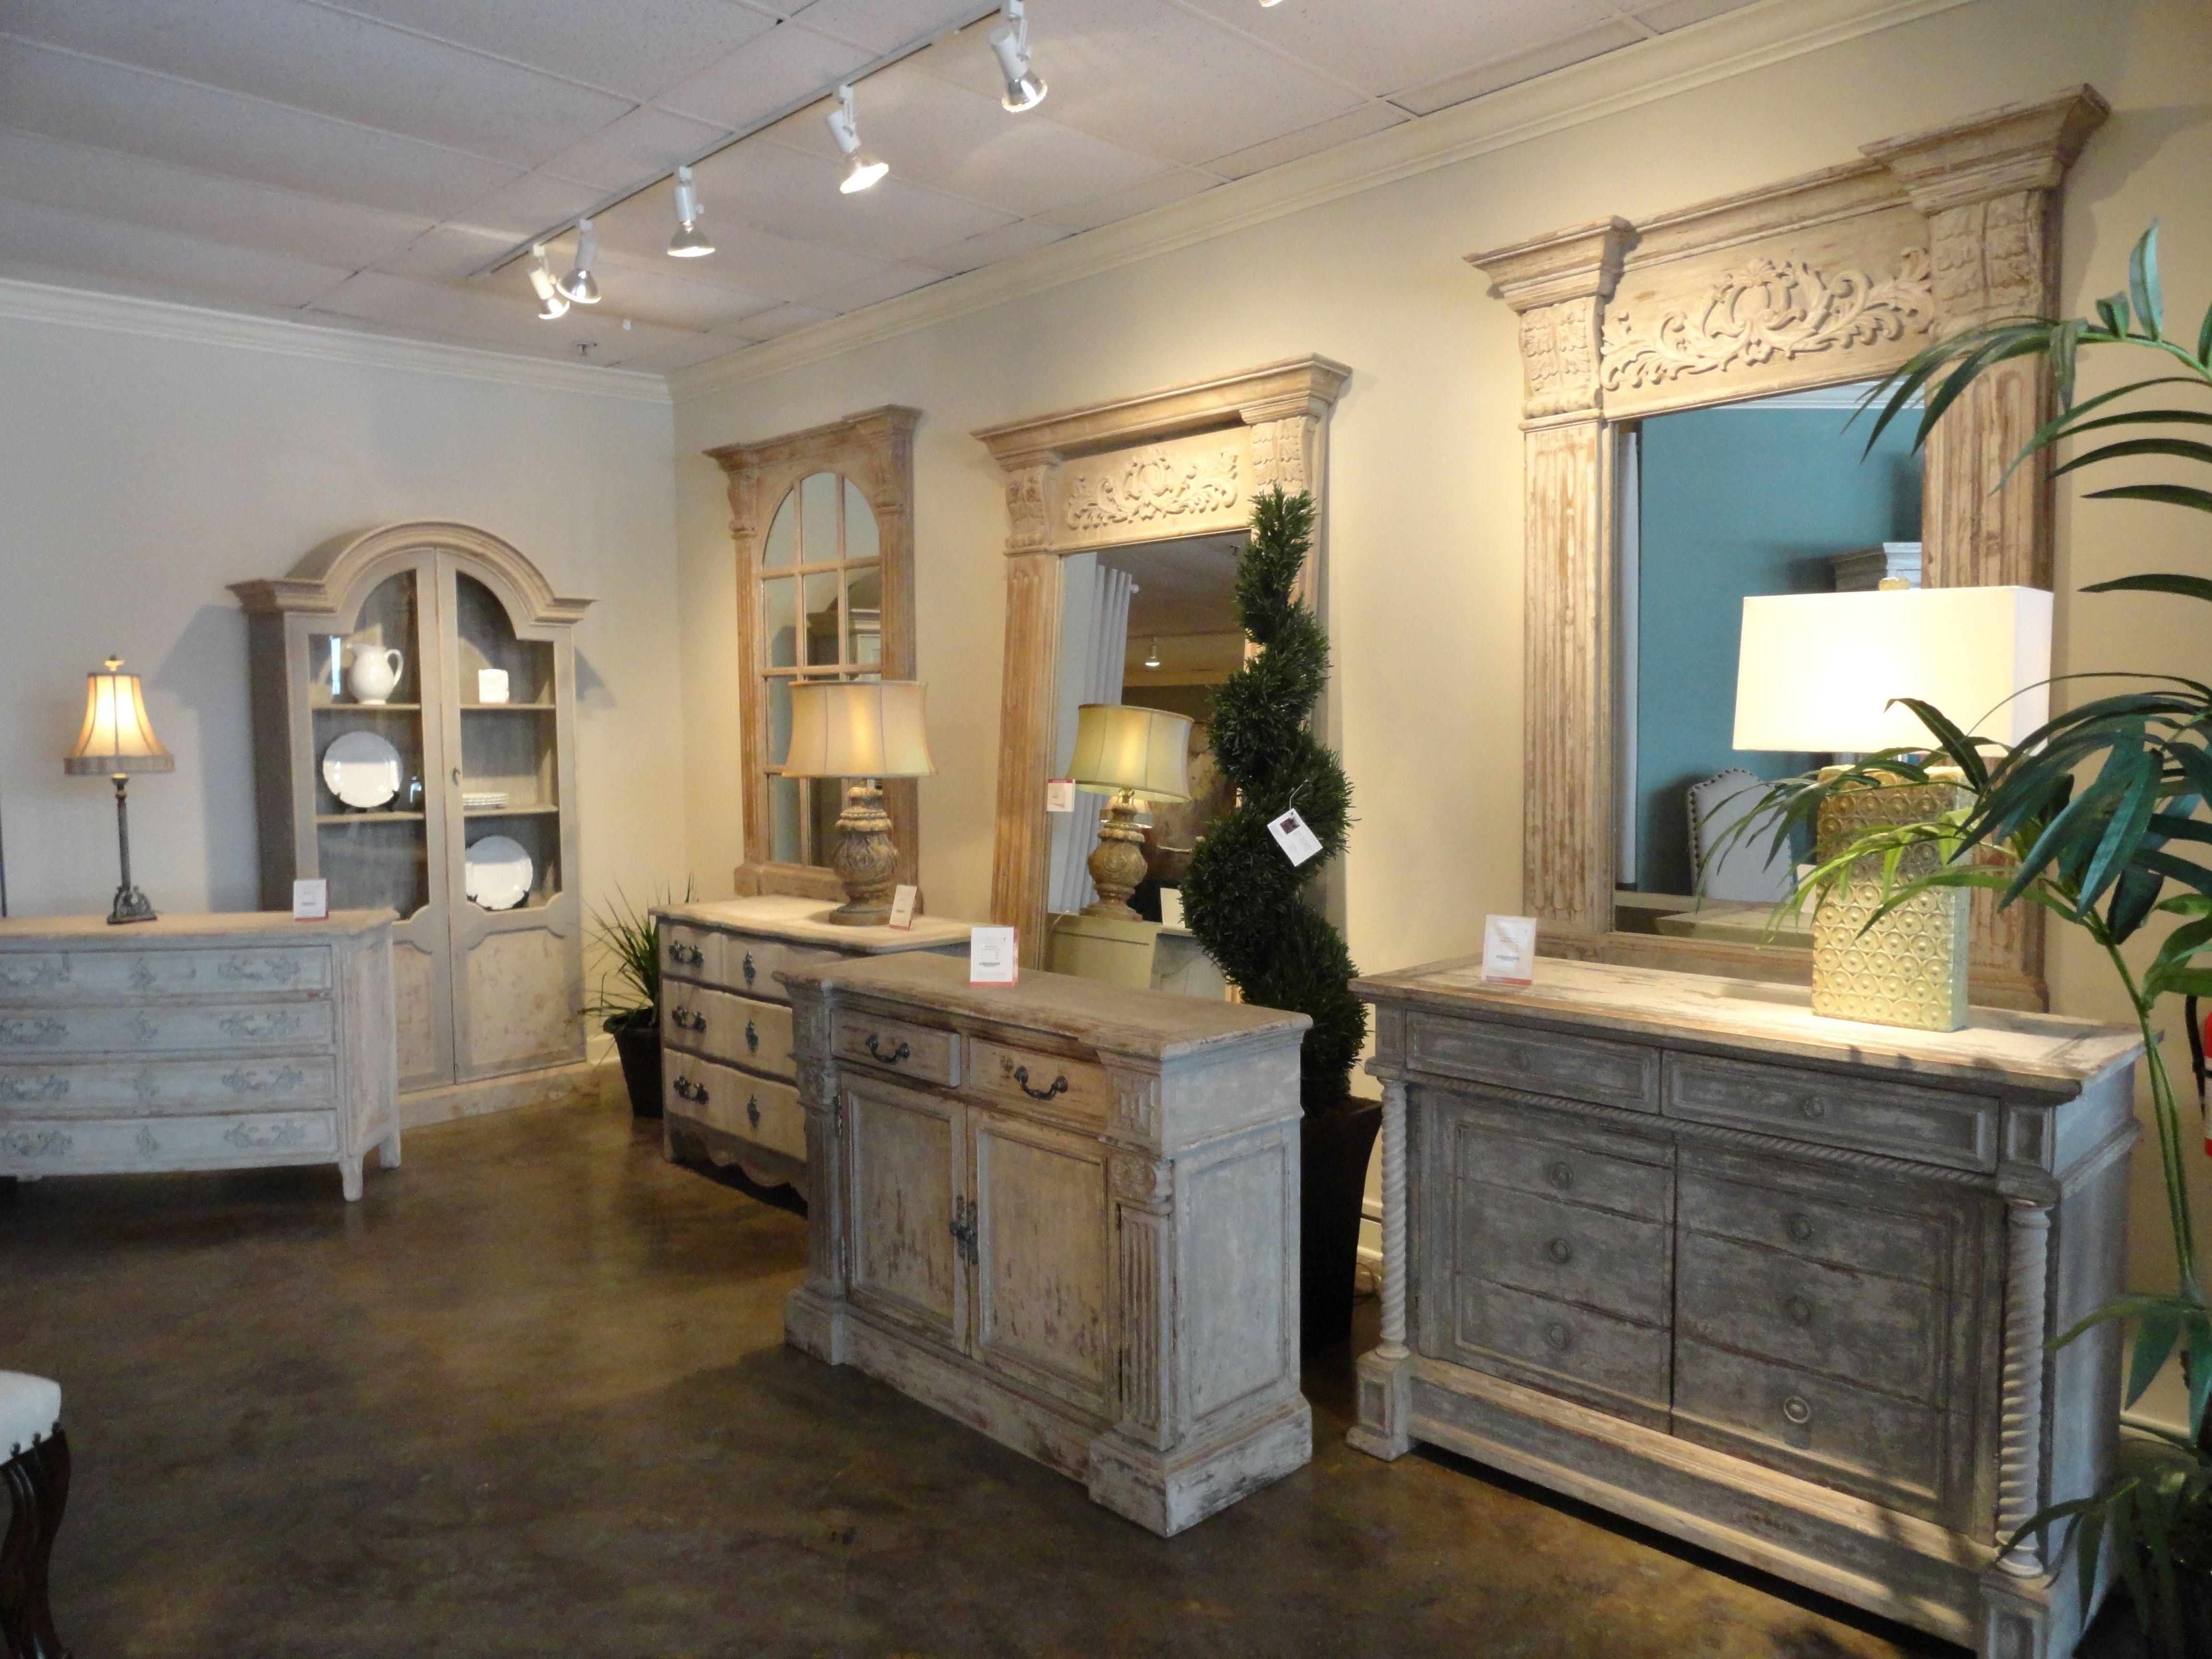 Reclaimed Wood Bedroom Furniture Ideas Ornate Reclaimed Wood Bedroom Set With Grey Distressed Polished Added  Vanity Bedroom And Dresser As Inspiring Rustic Bedroom Gray Furniture Ideas